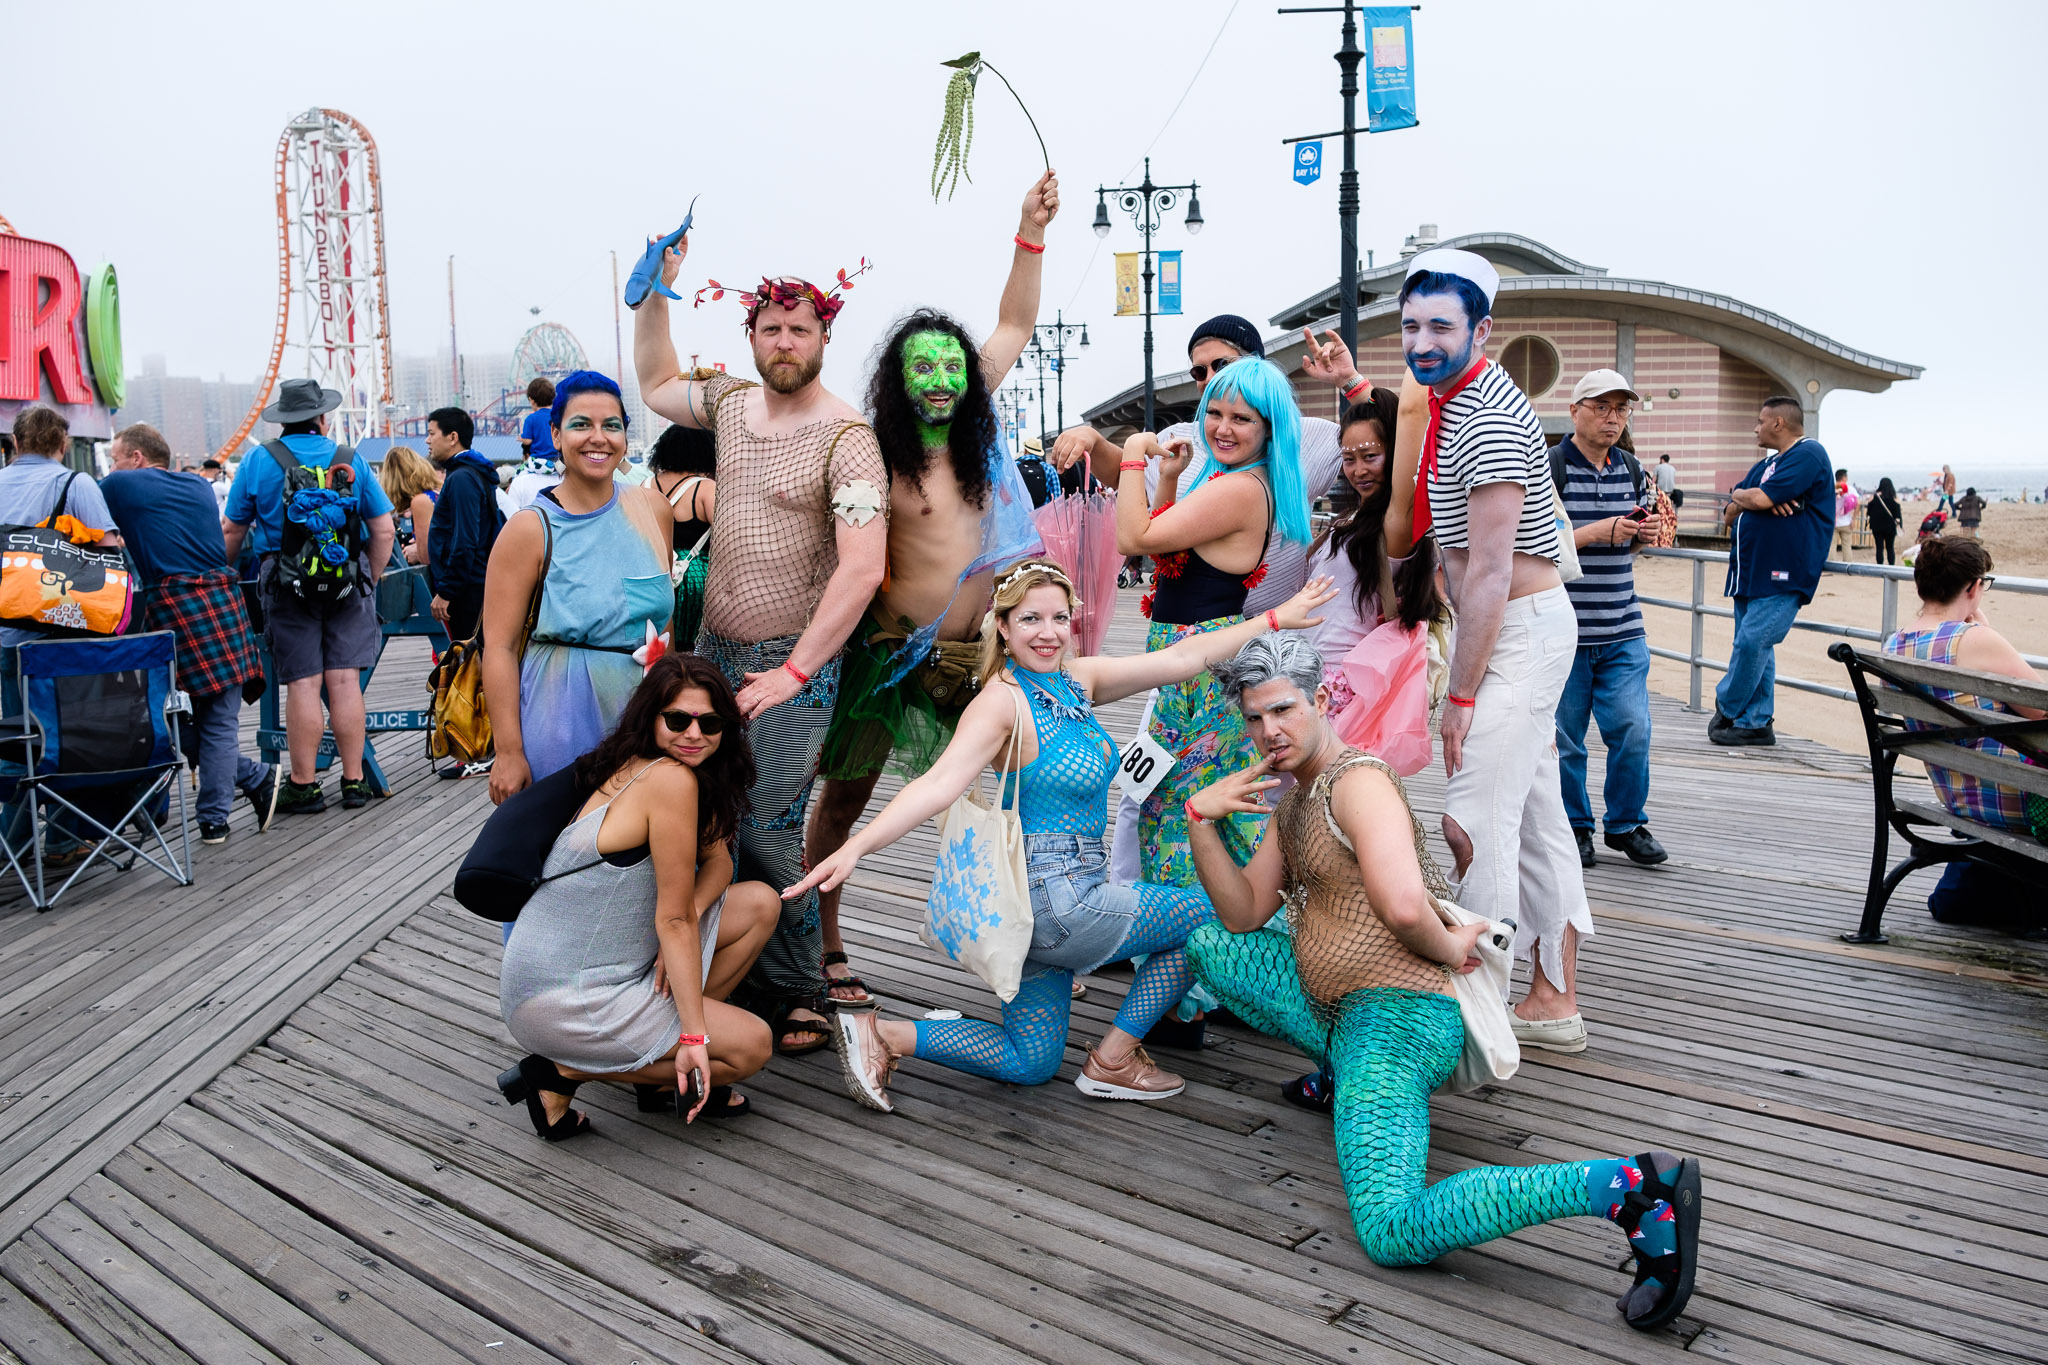 mermaidparade2017_015.jpg